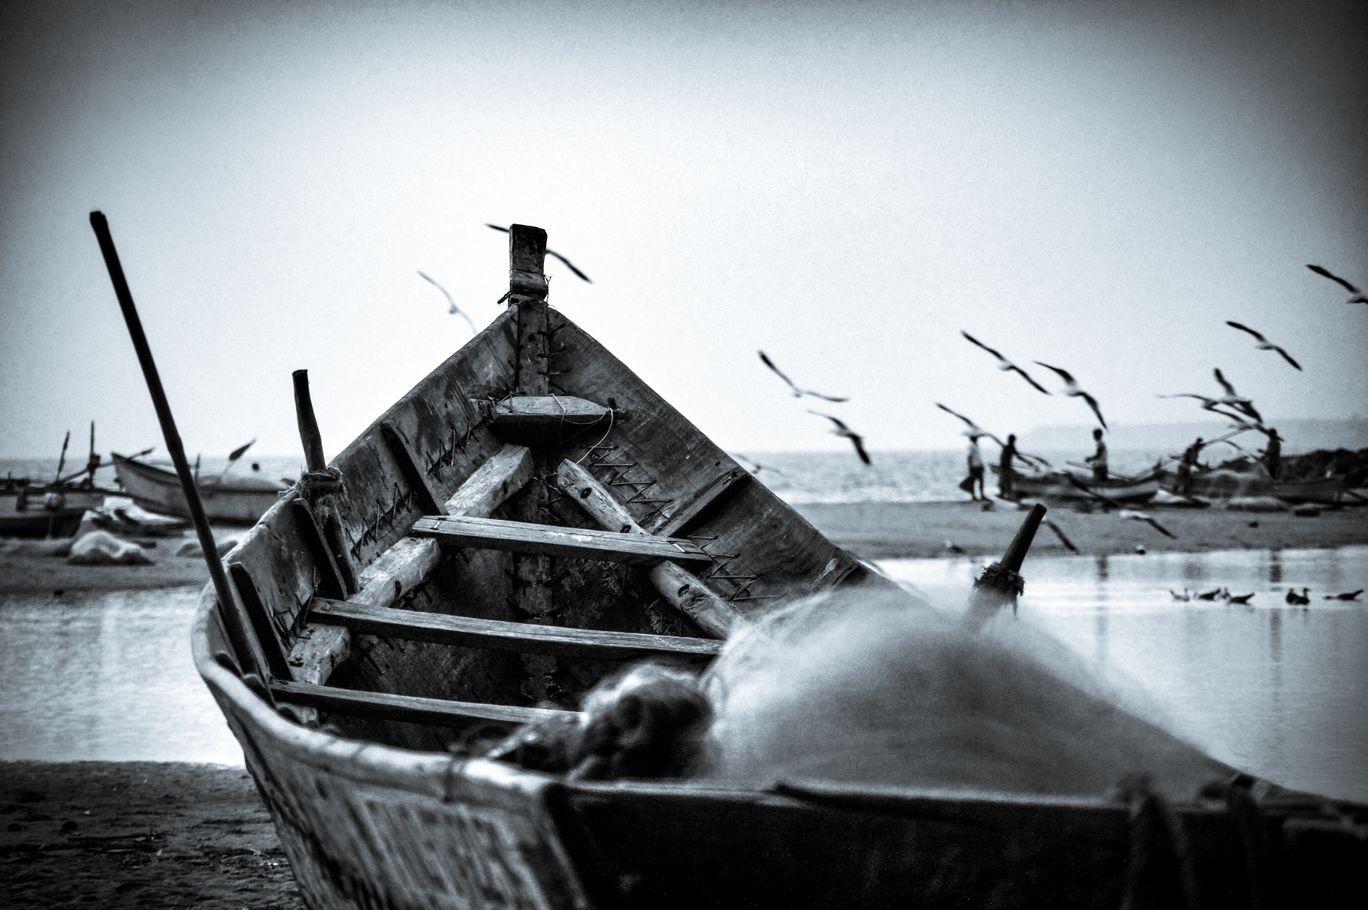 Photo of Malvan By Rahul Devrukhkar